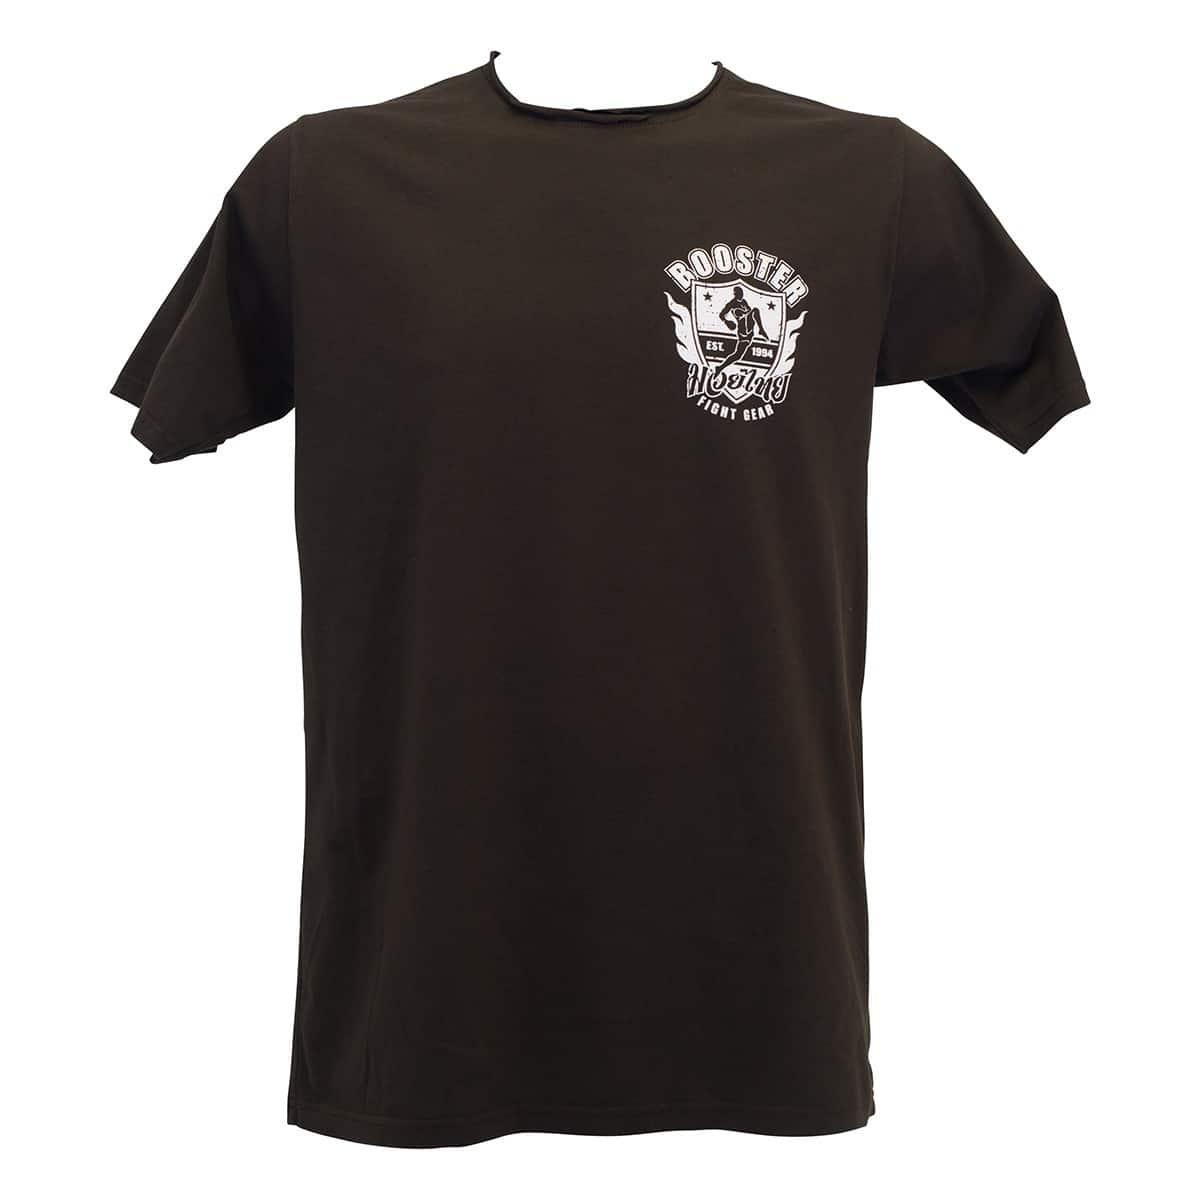 T-shirt BOOSTER KNEE CHA Brun